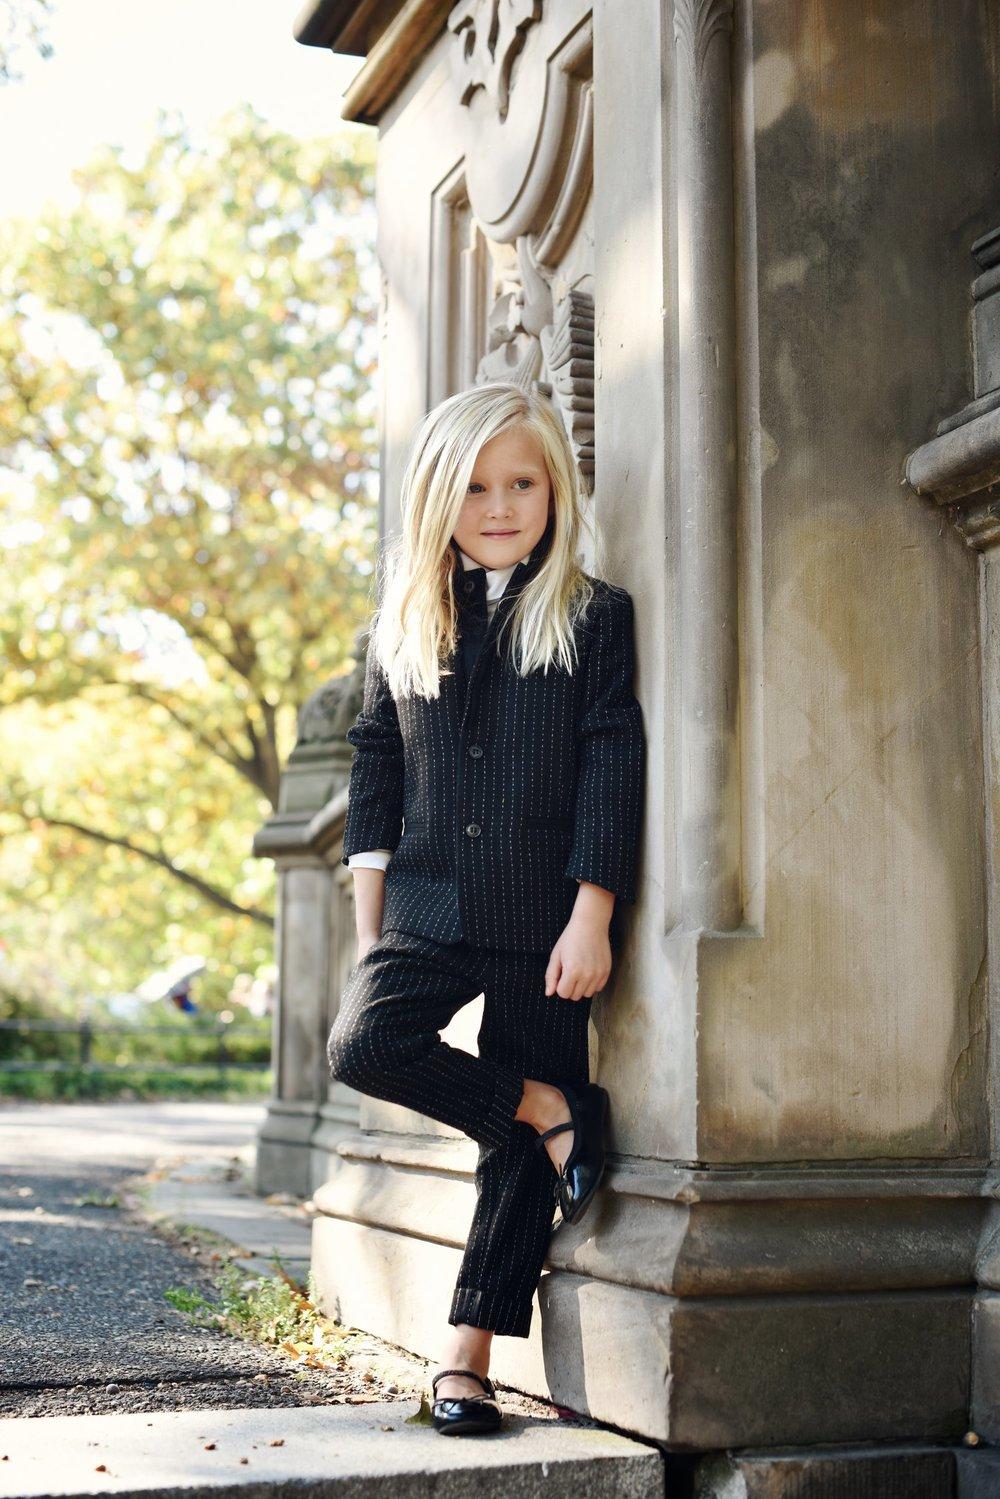 Enfant+Street+Style+by+Gina+Kim+Photography.jpeg